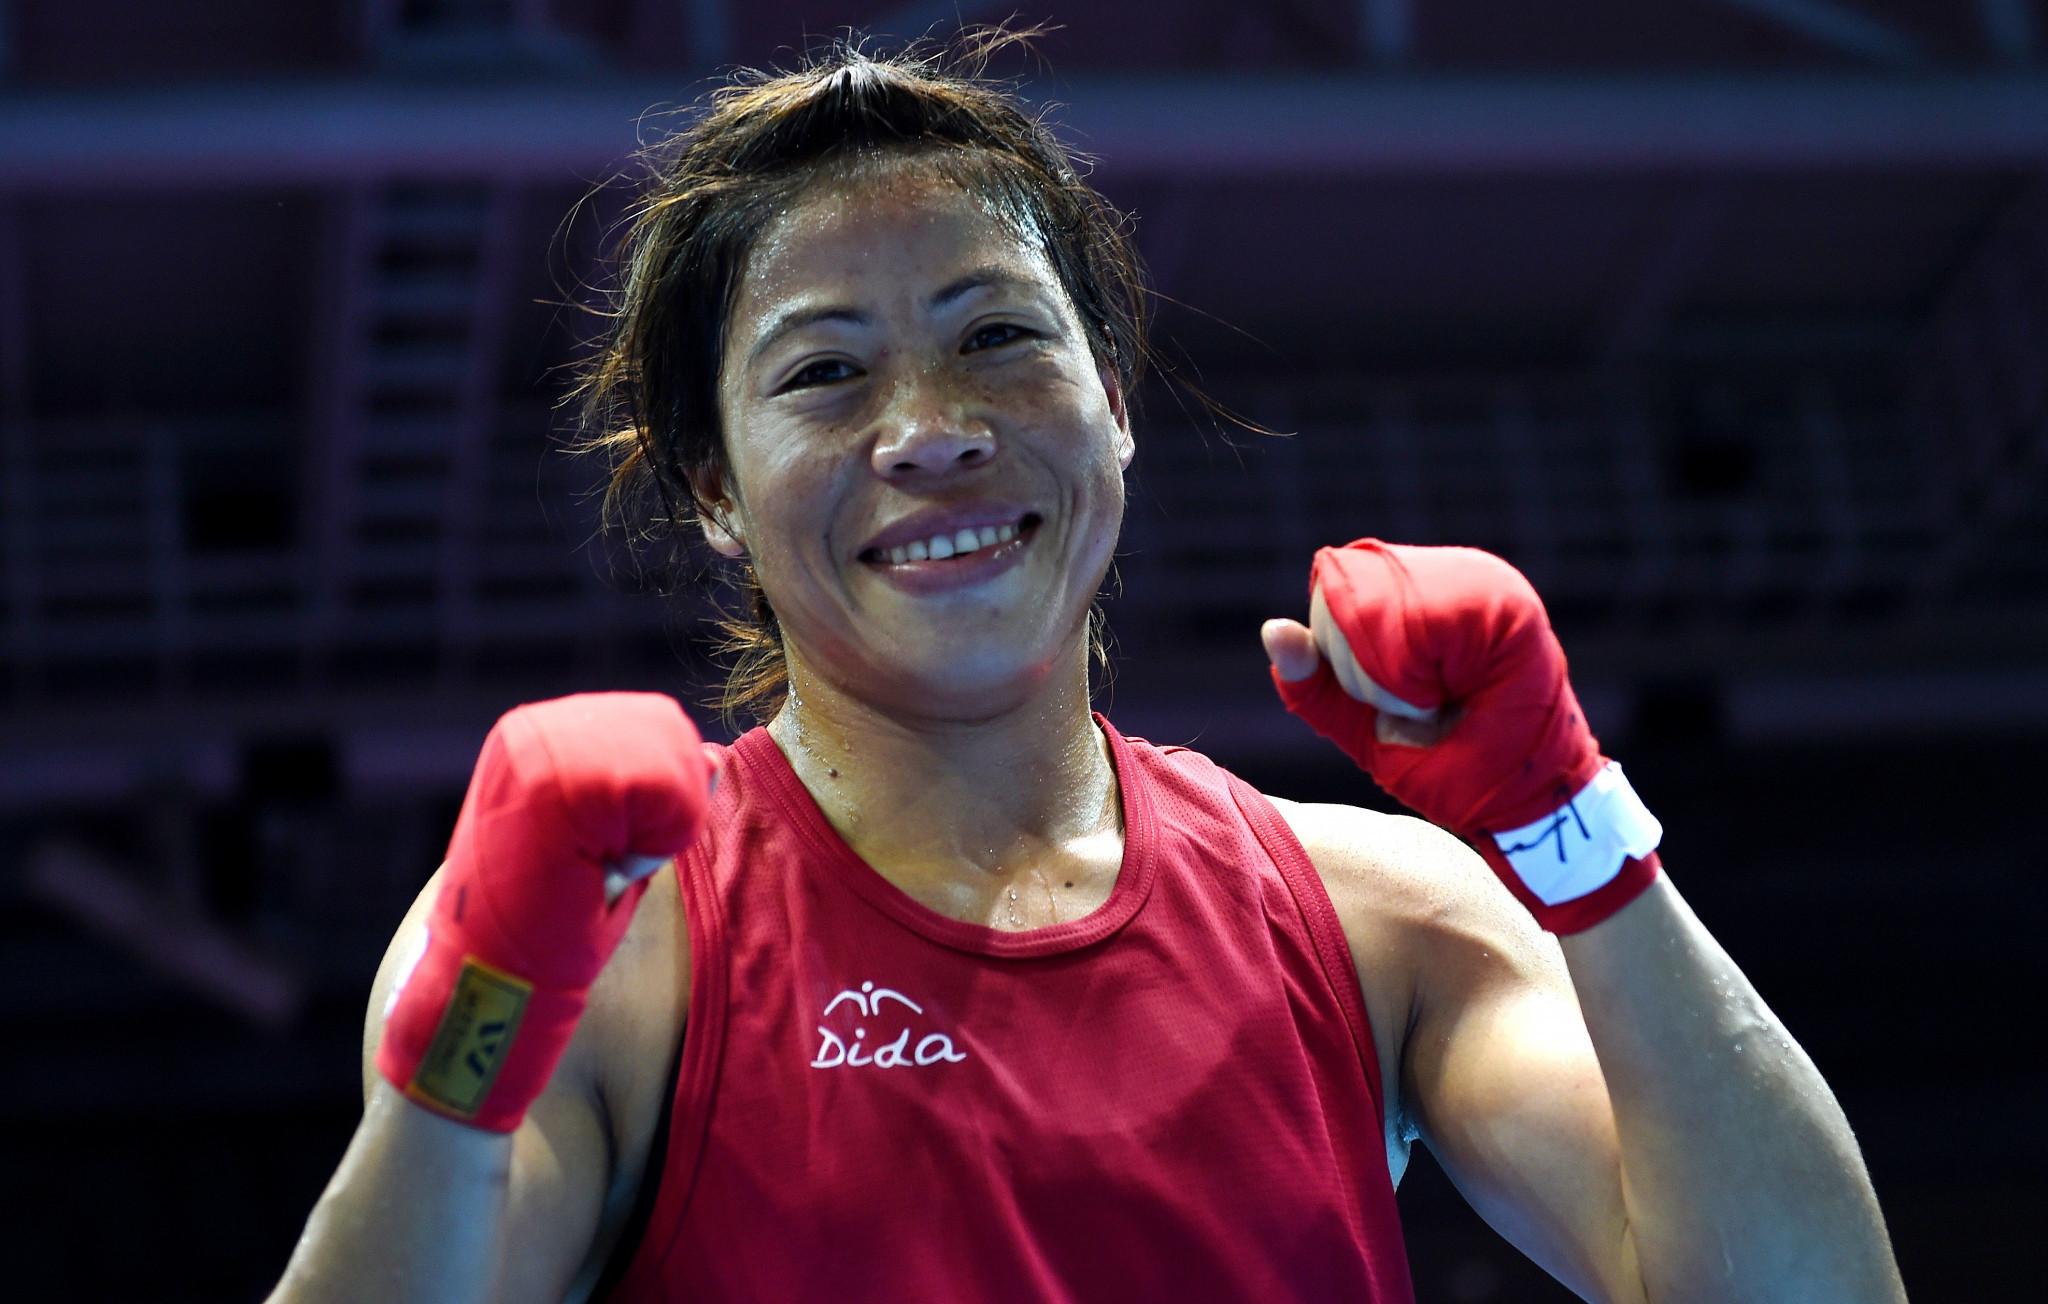 Boxing world champion Kom to step up Tokyo 2020 preparations at national camp